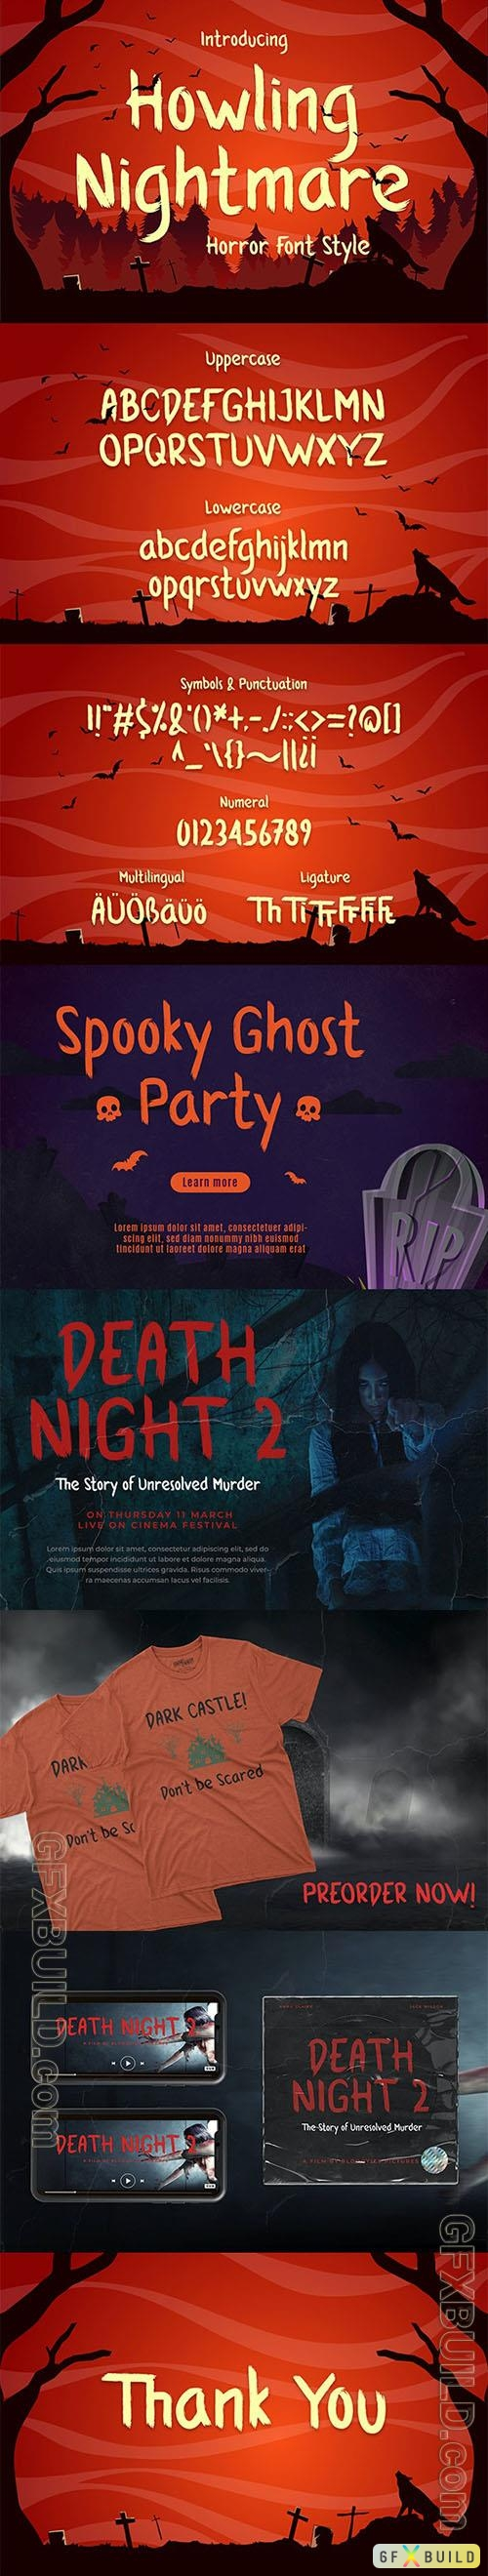 GR - Howling Nightmare - Horror Font 31750451